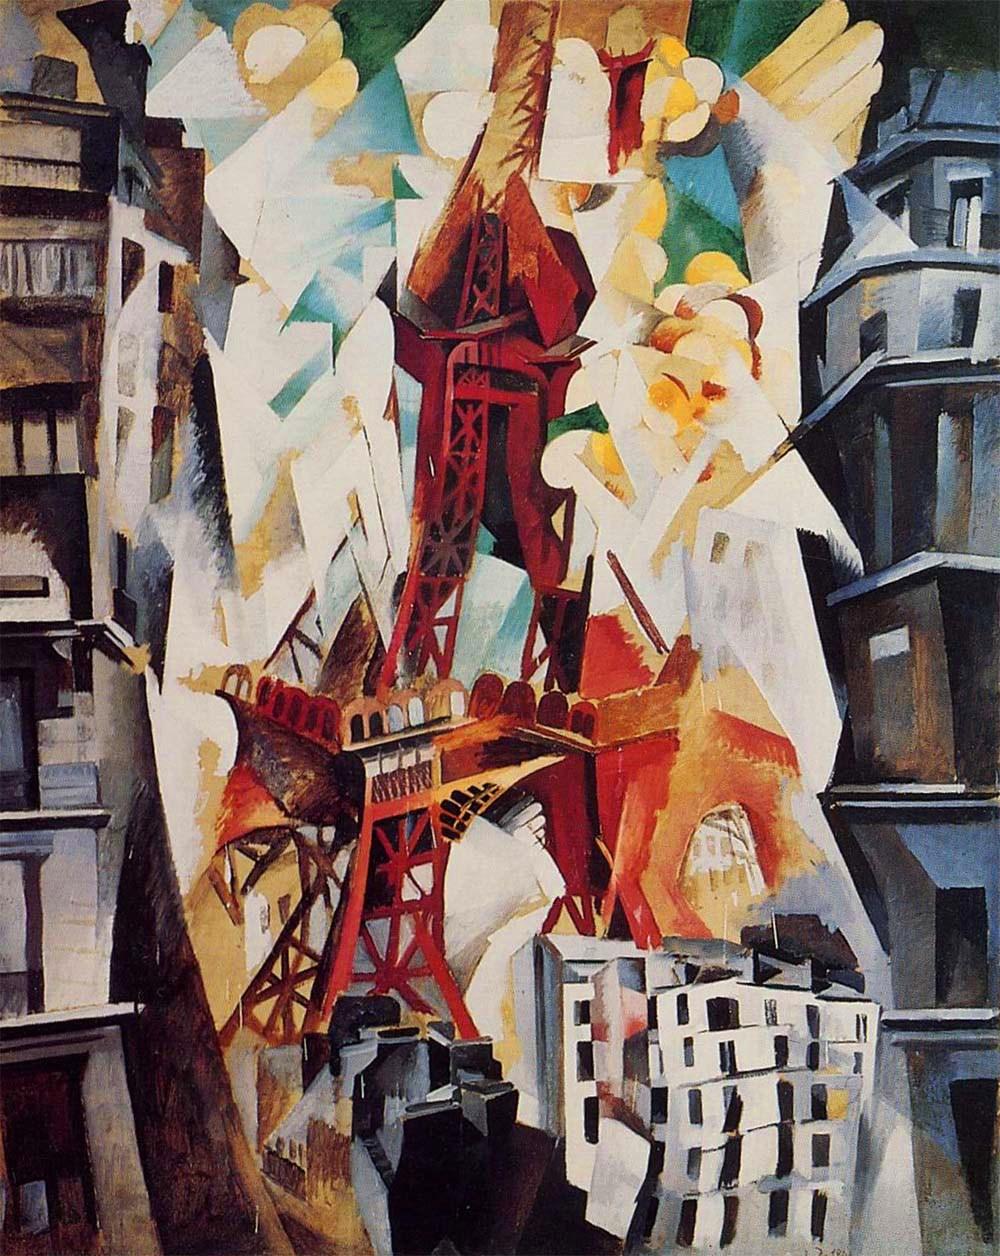 Robert Delaunay,  Champs de Mars, La Tour rouge , 1911, Art Institute of Chicago.